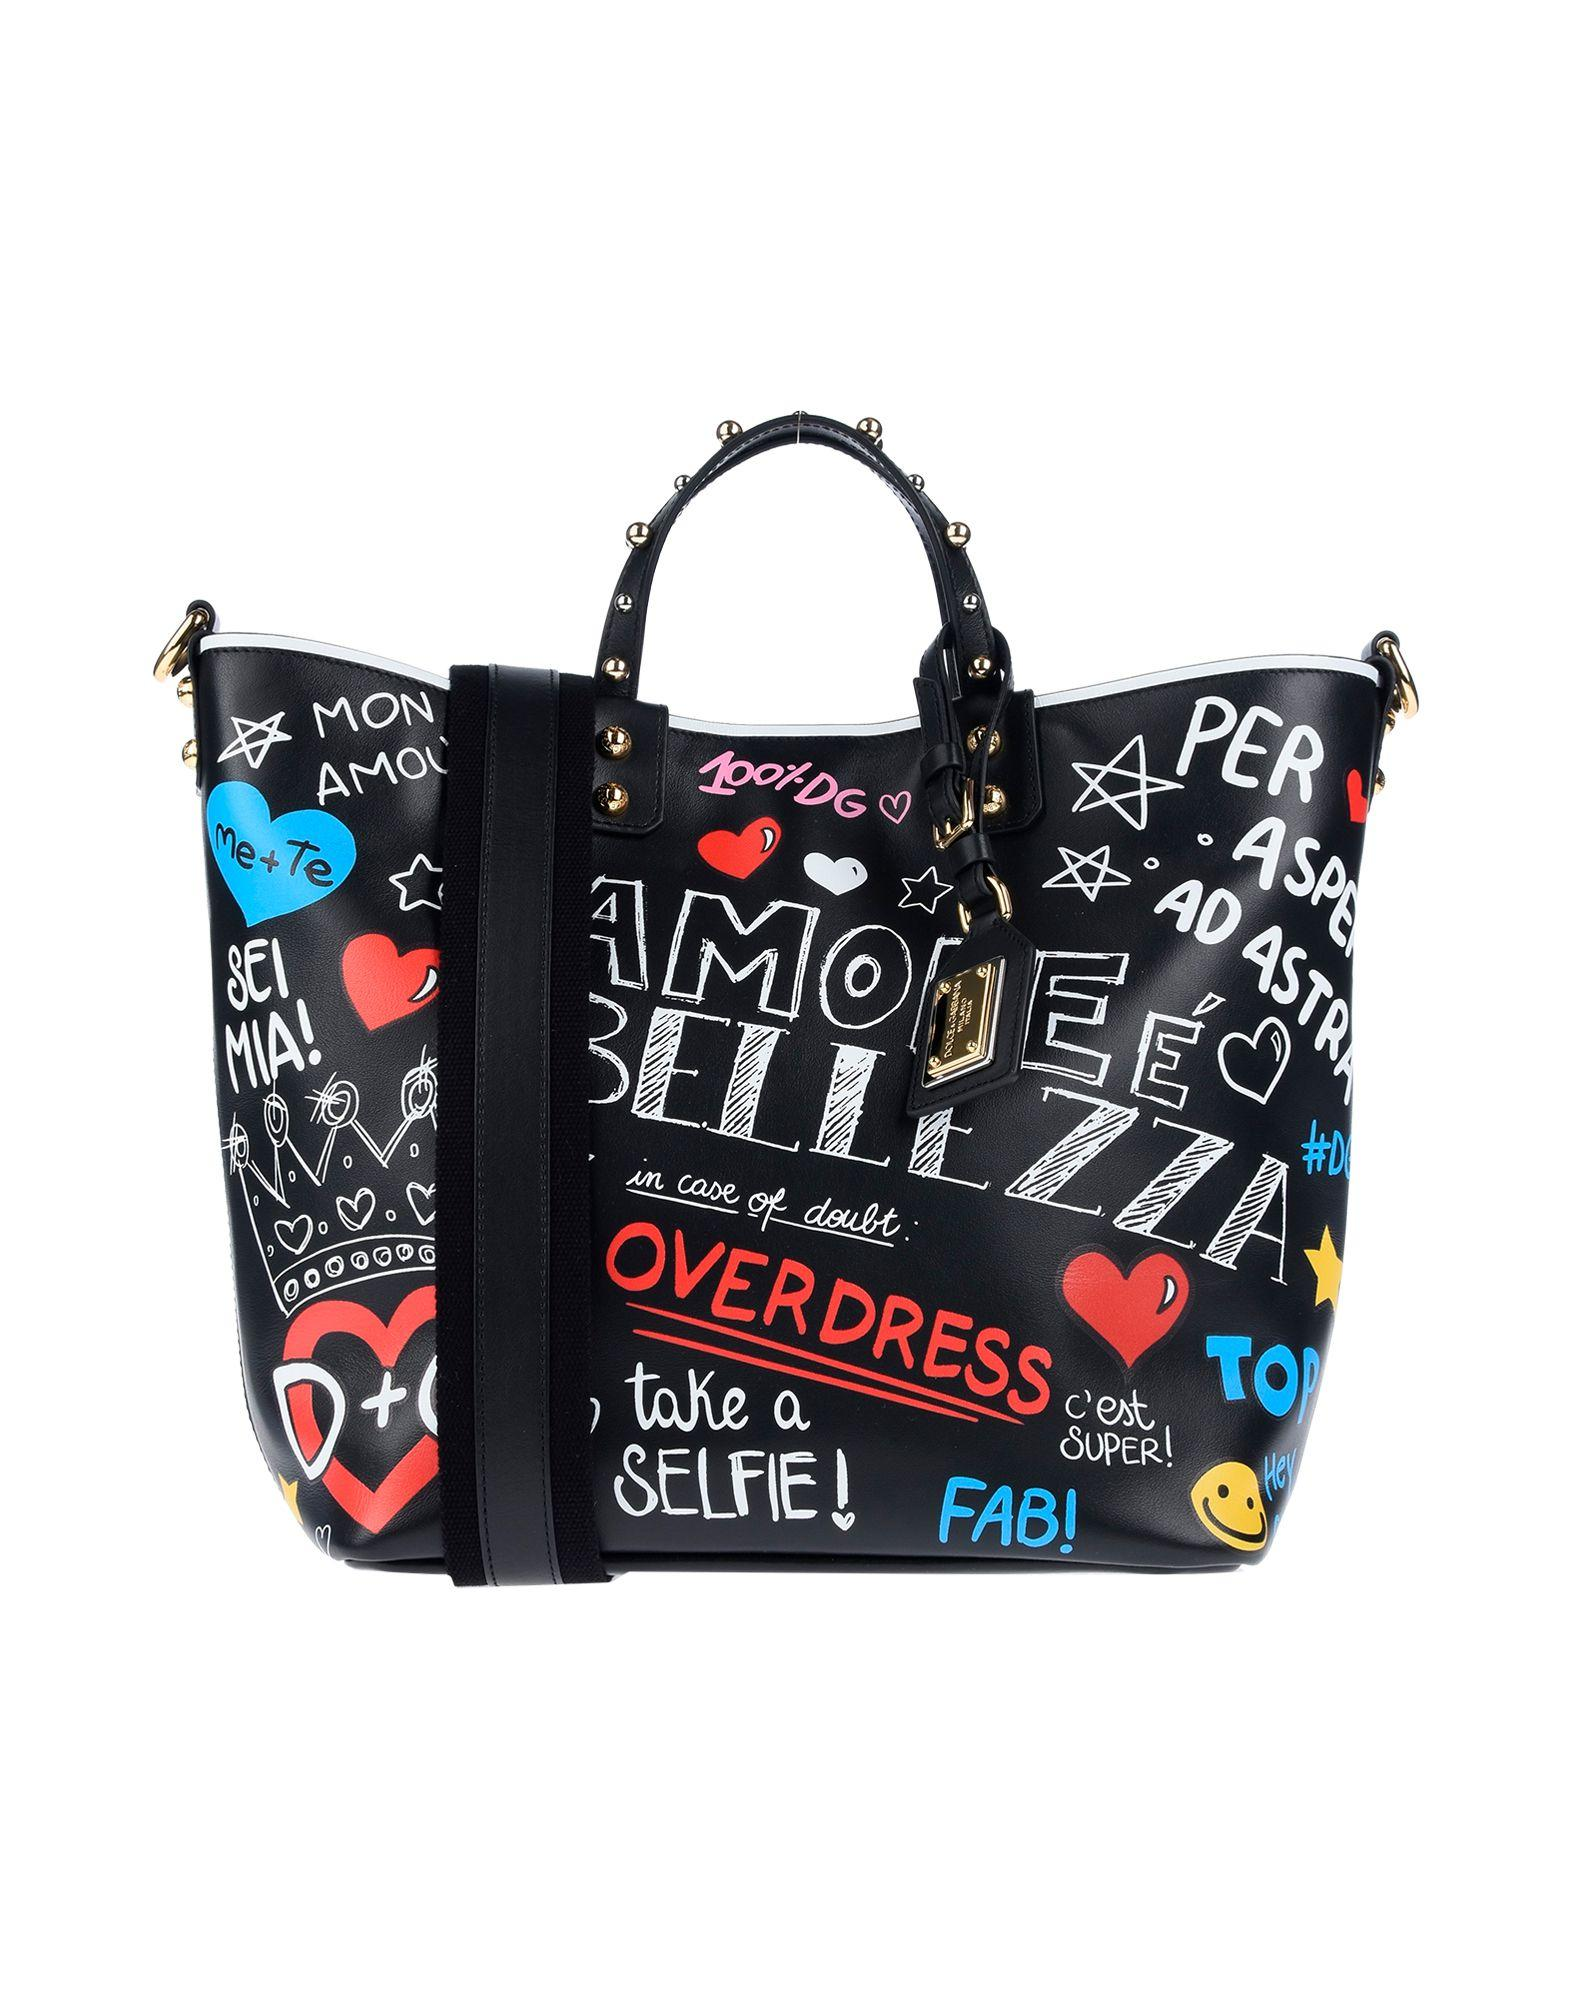 9e4ec2e8aeed Dolce   Gabbana Handbag in Black - Save 46% - Lyst